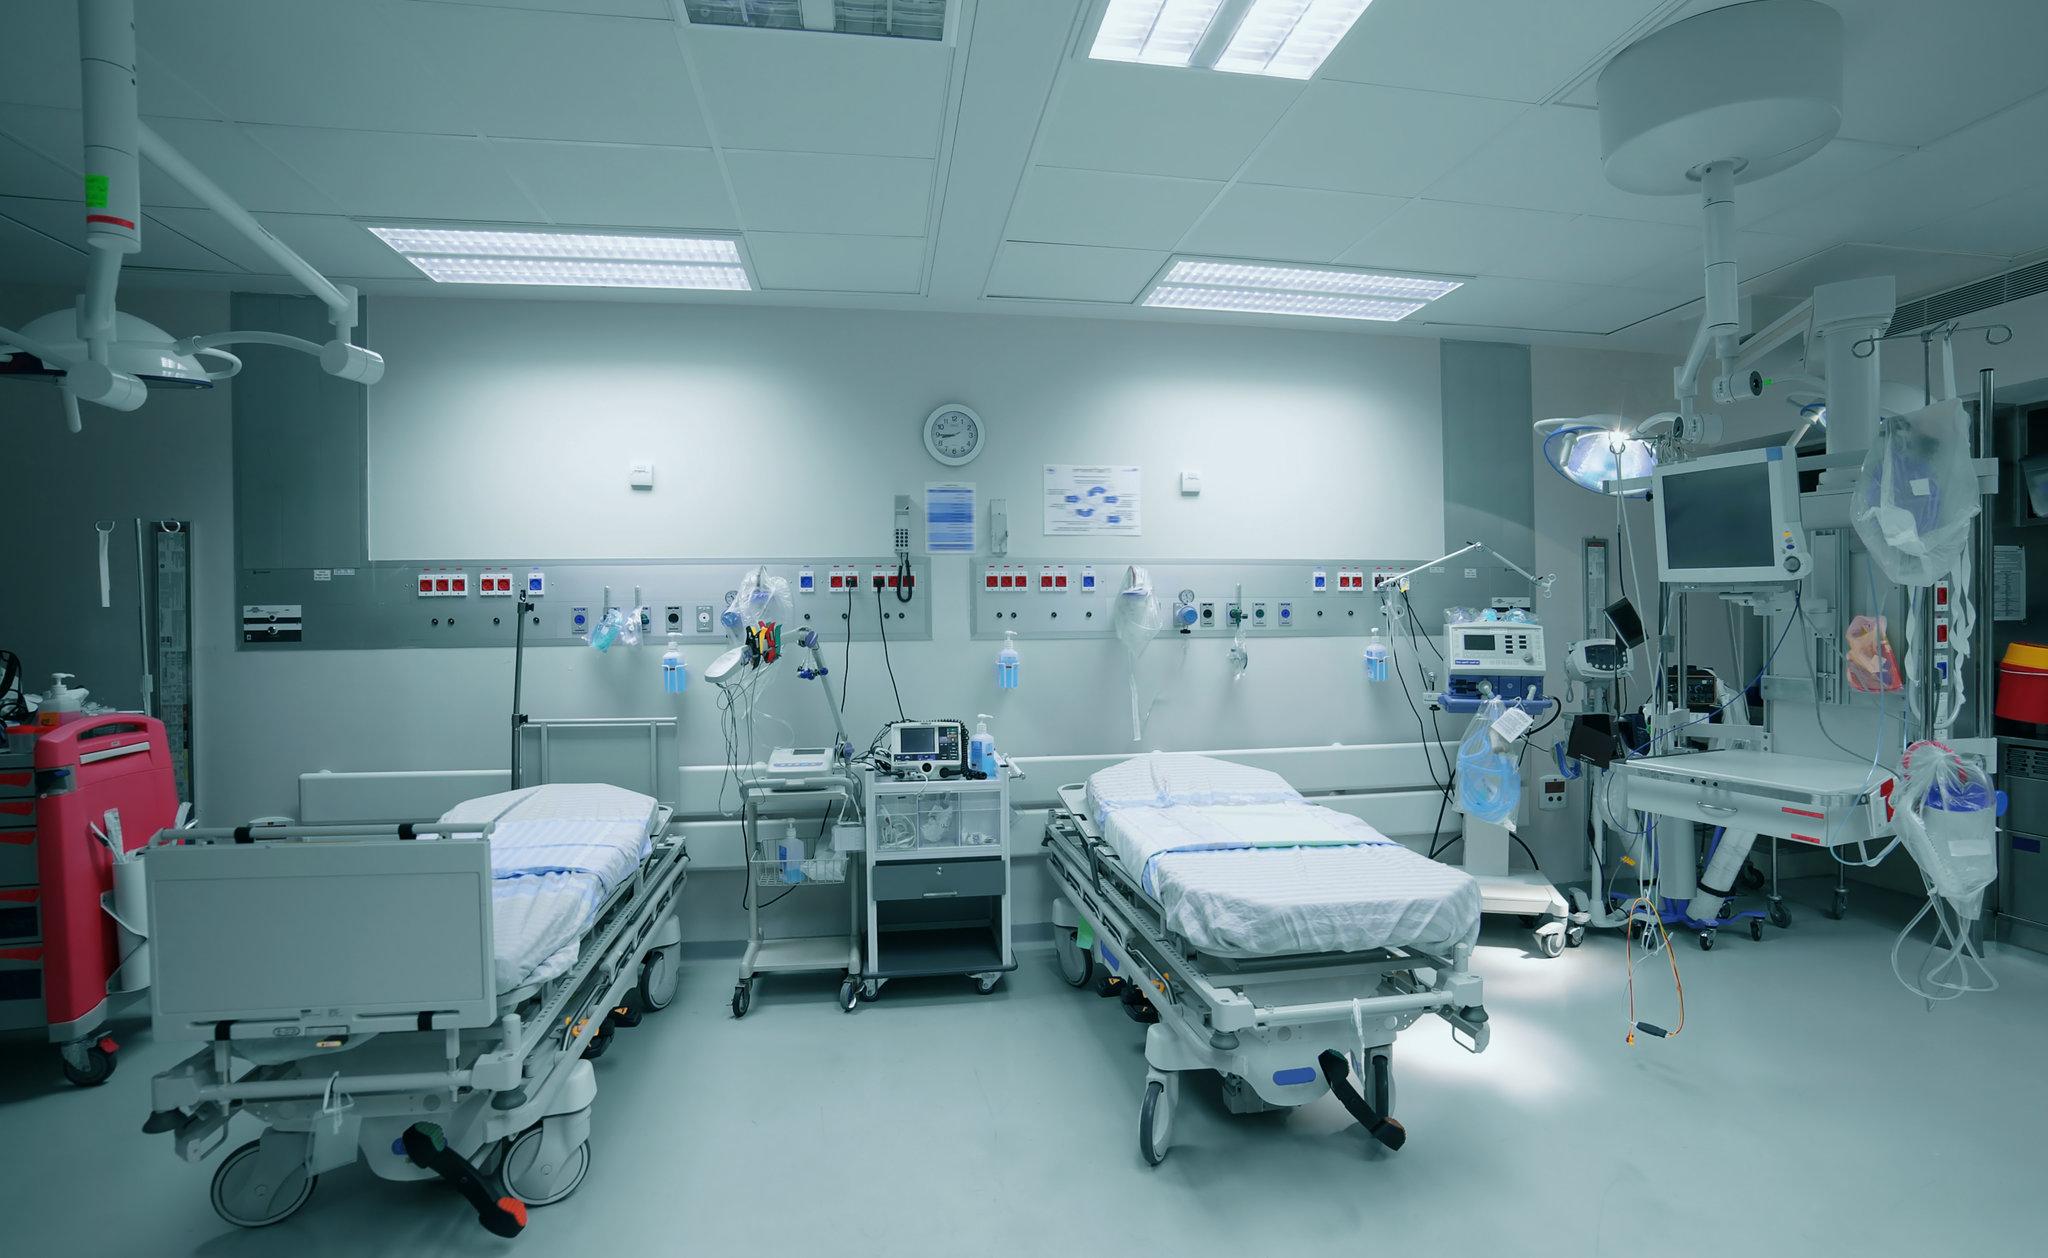 شروط انشاء مستشفى خاص